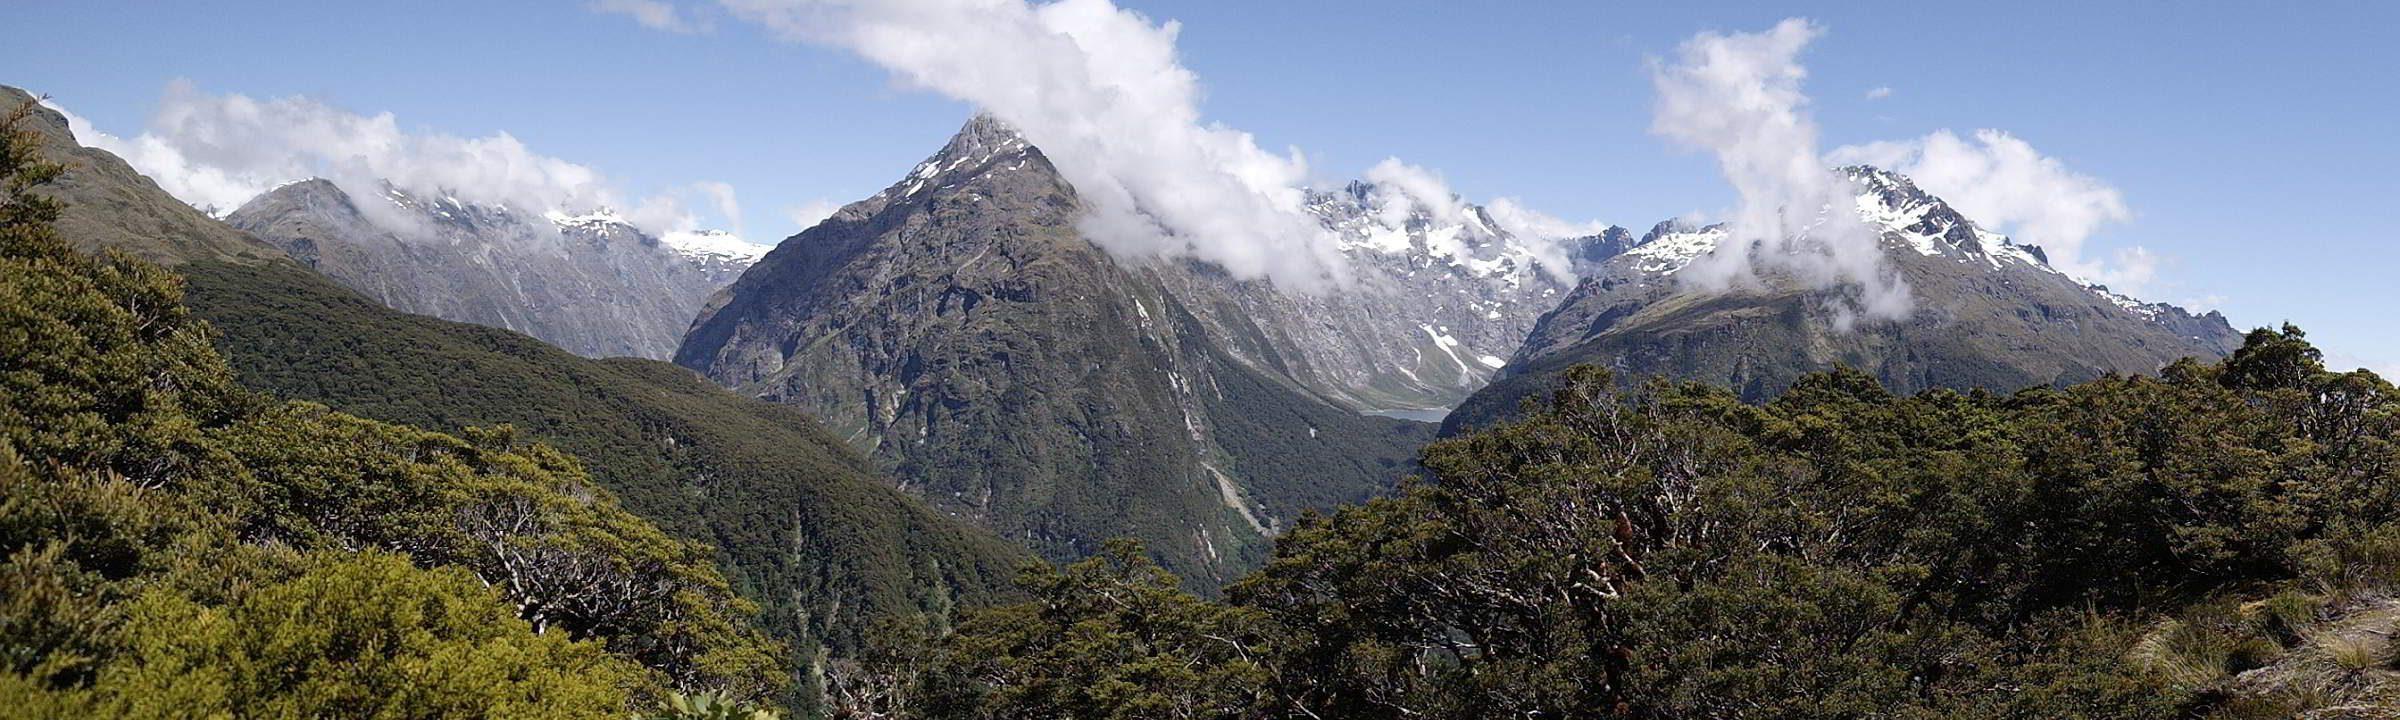 Rundreise Neuseeland: Einmal hin, alles drin